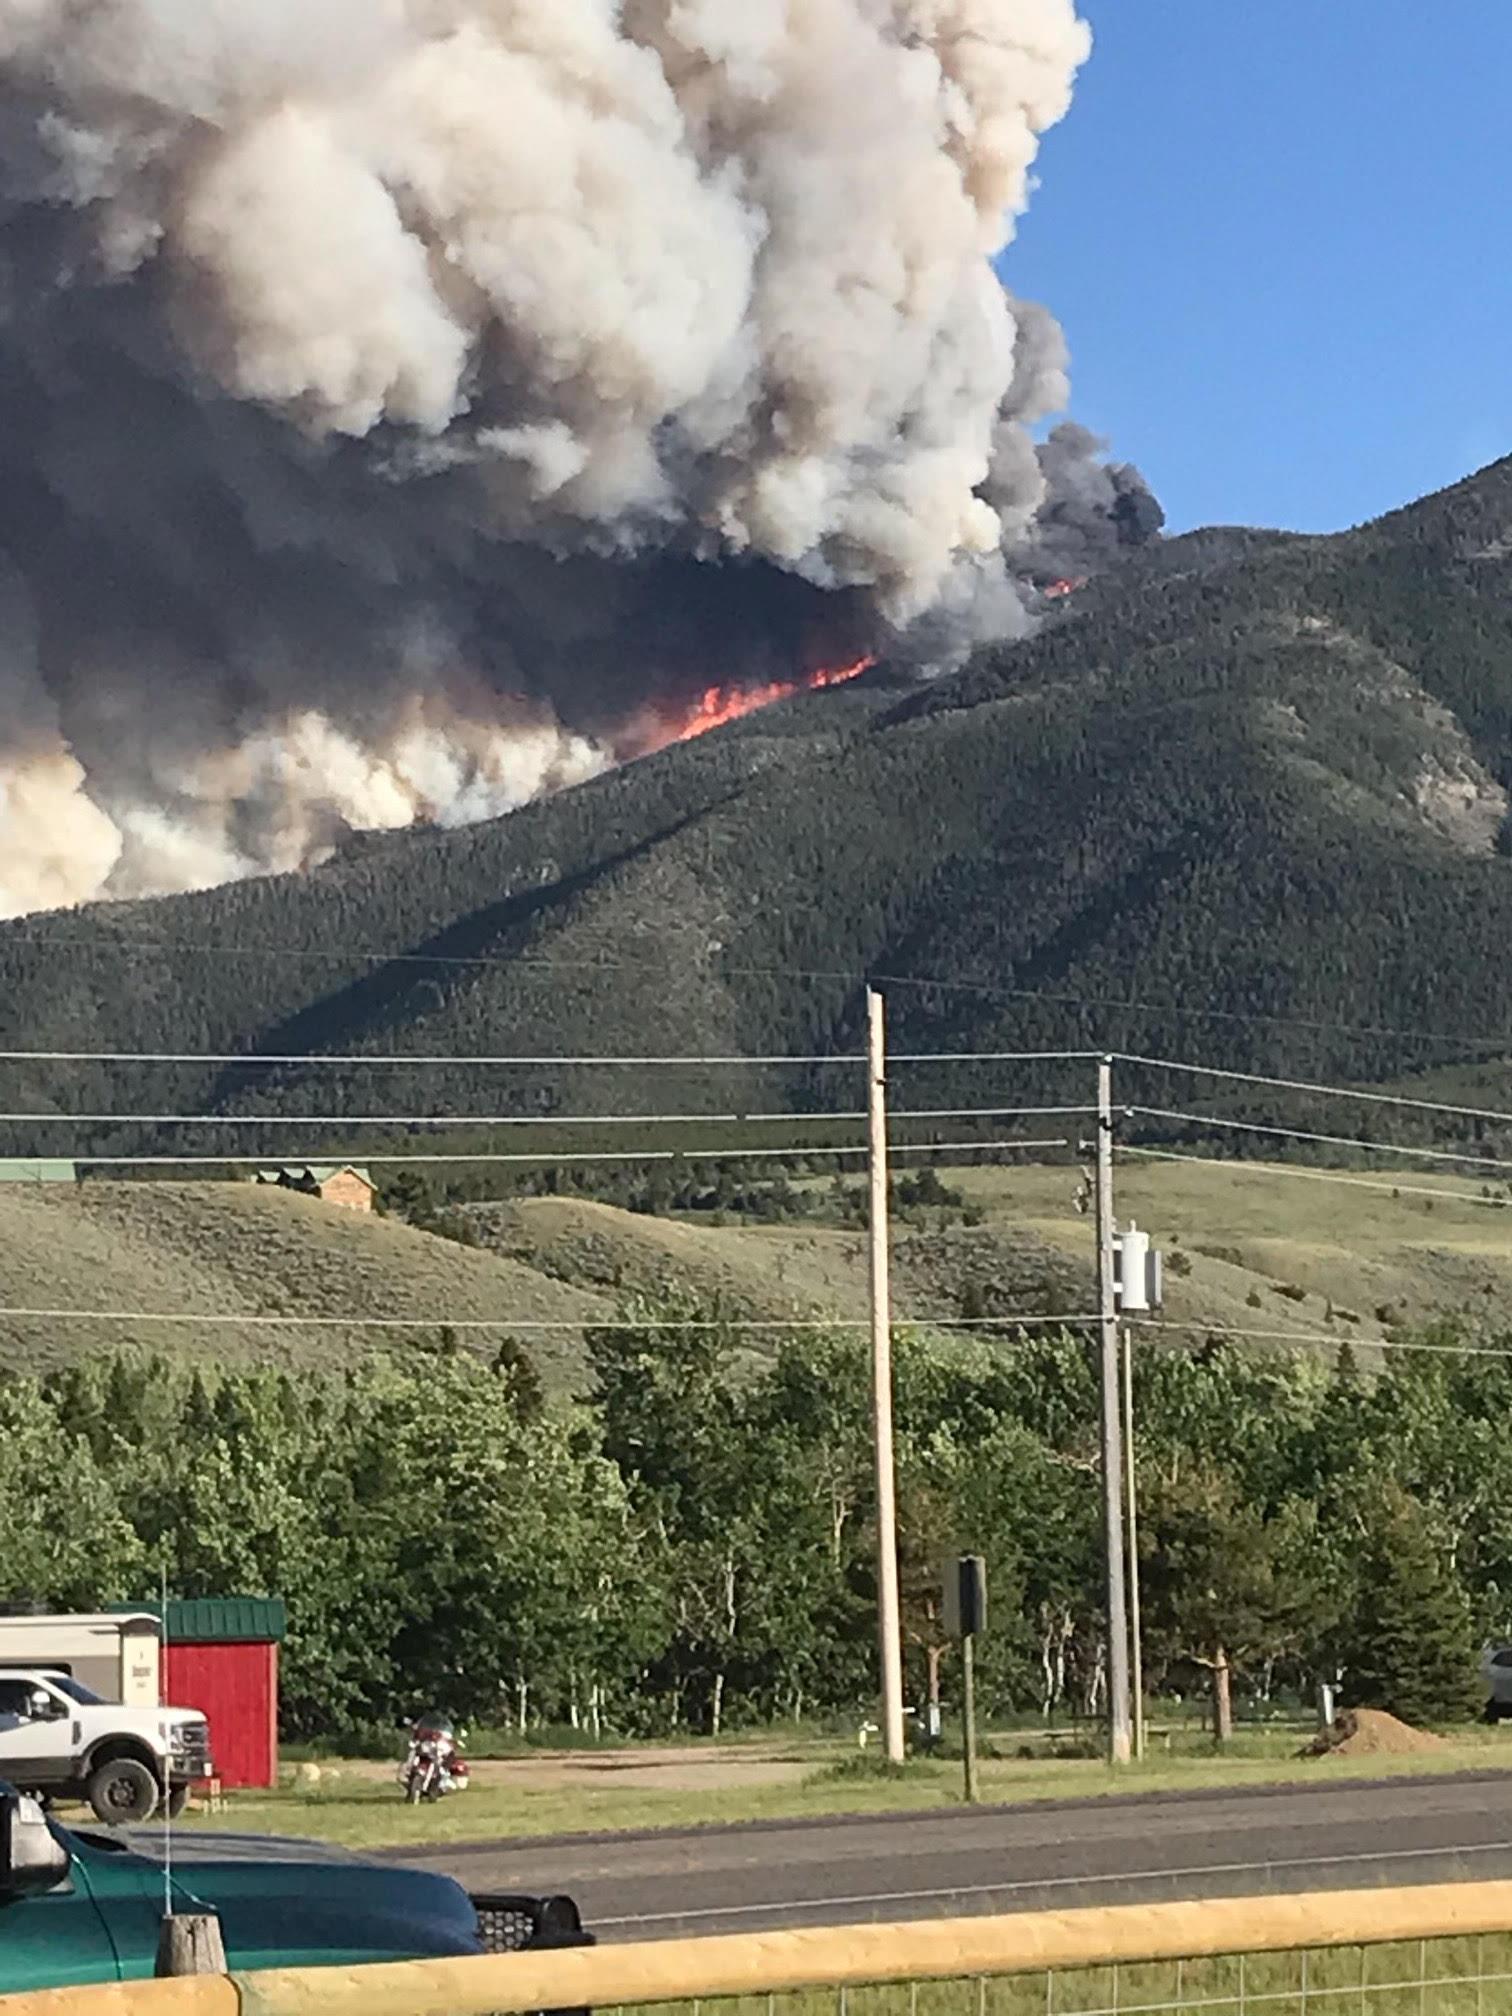 Montana just added a new season -- fire season